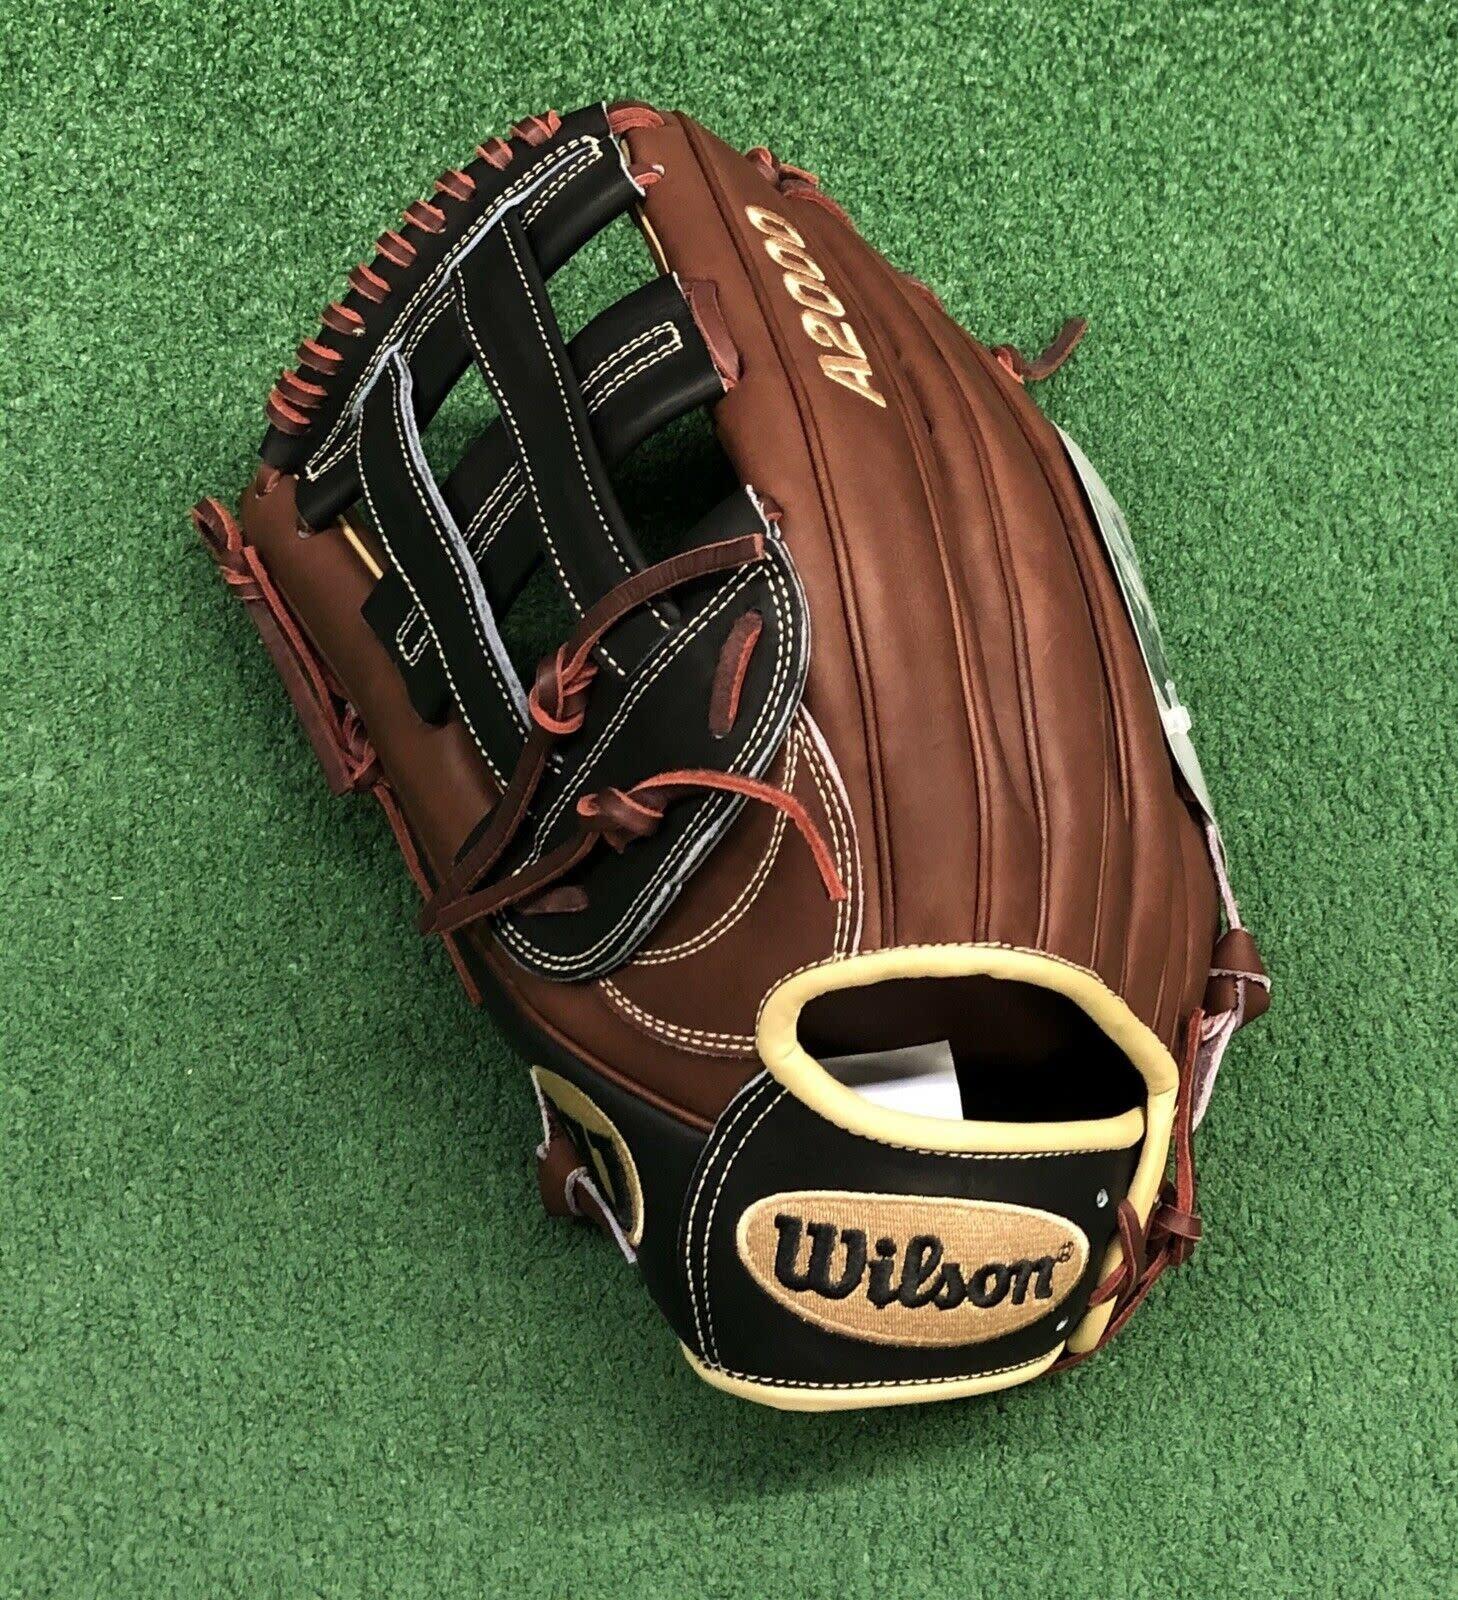 "Wilson 2020 WILSON A2000 1799 BBG BRN/BLONDE 12.75"" LHT"